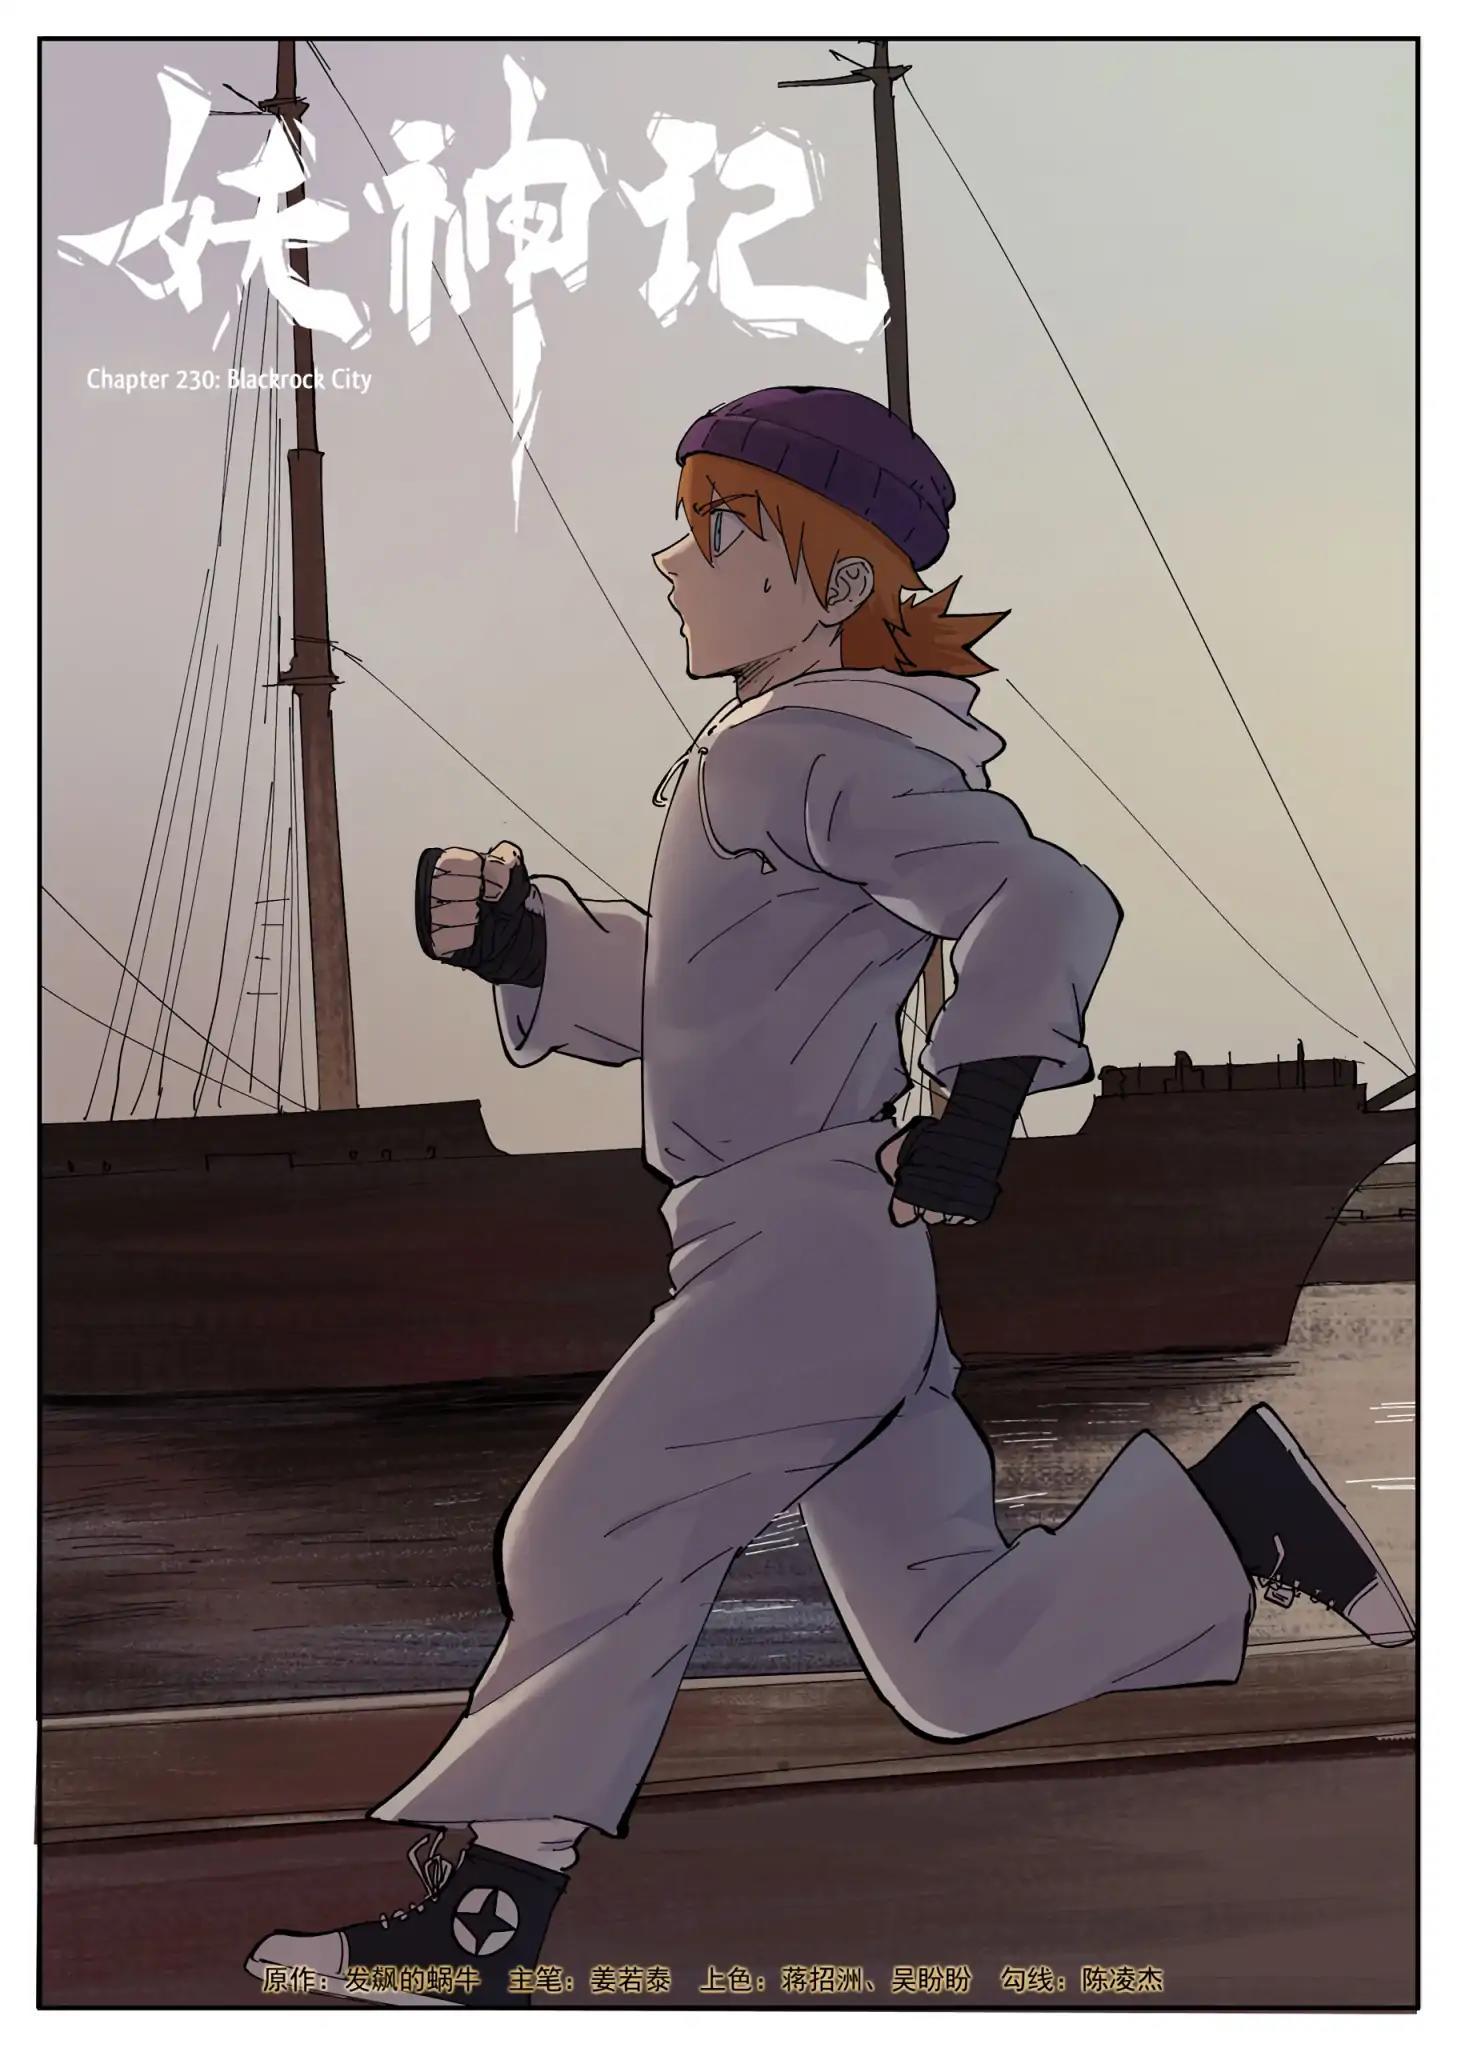 https://manga.mangadogs.com/comics/pic2/34/98/767638/299efdd2e6abd58cc20b531338c1f29b.jpg Page 1